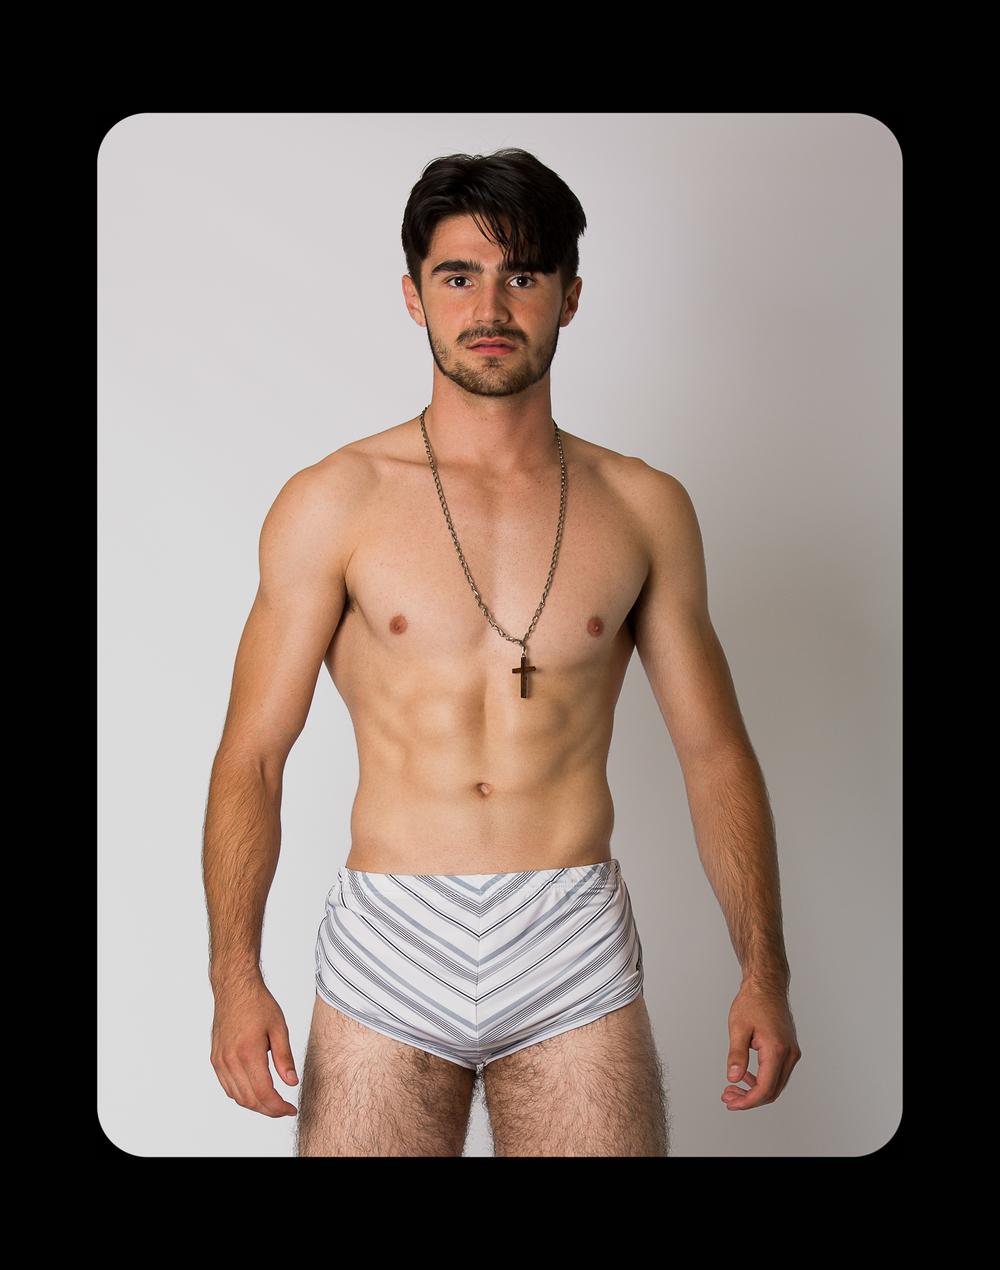 Raul Flores Desins Mens Underwear 2015-1 (dragged) 10.jpg